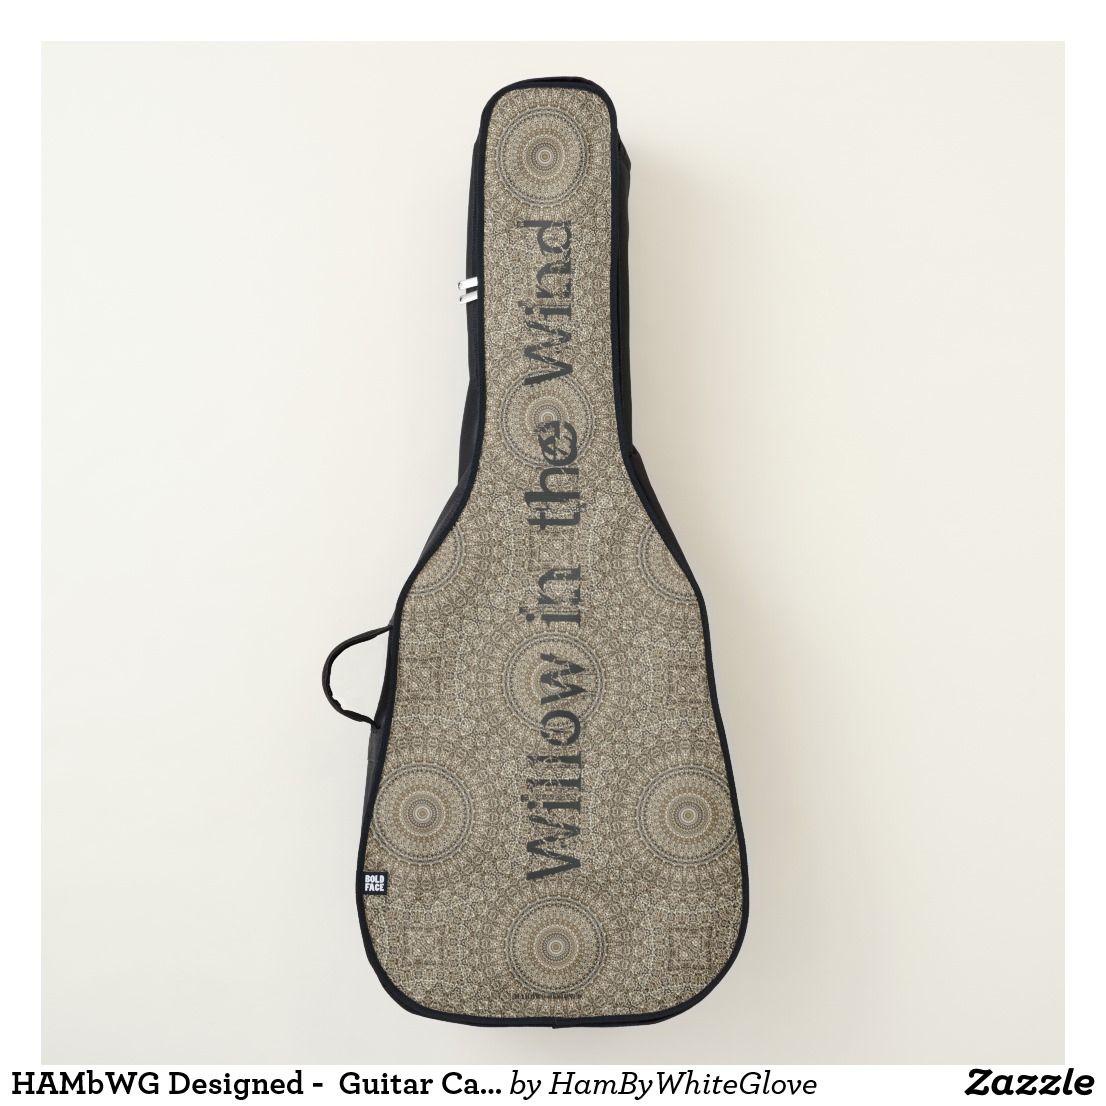 Pin On Hambwg Guitar Cases Hambywhiteglove